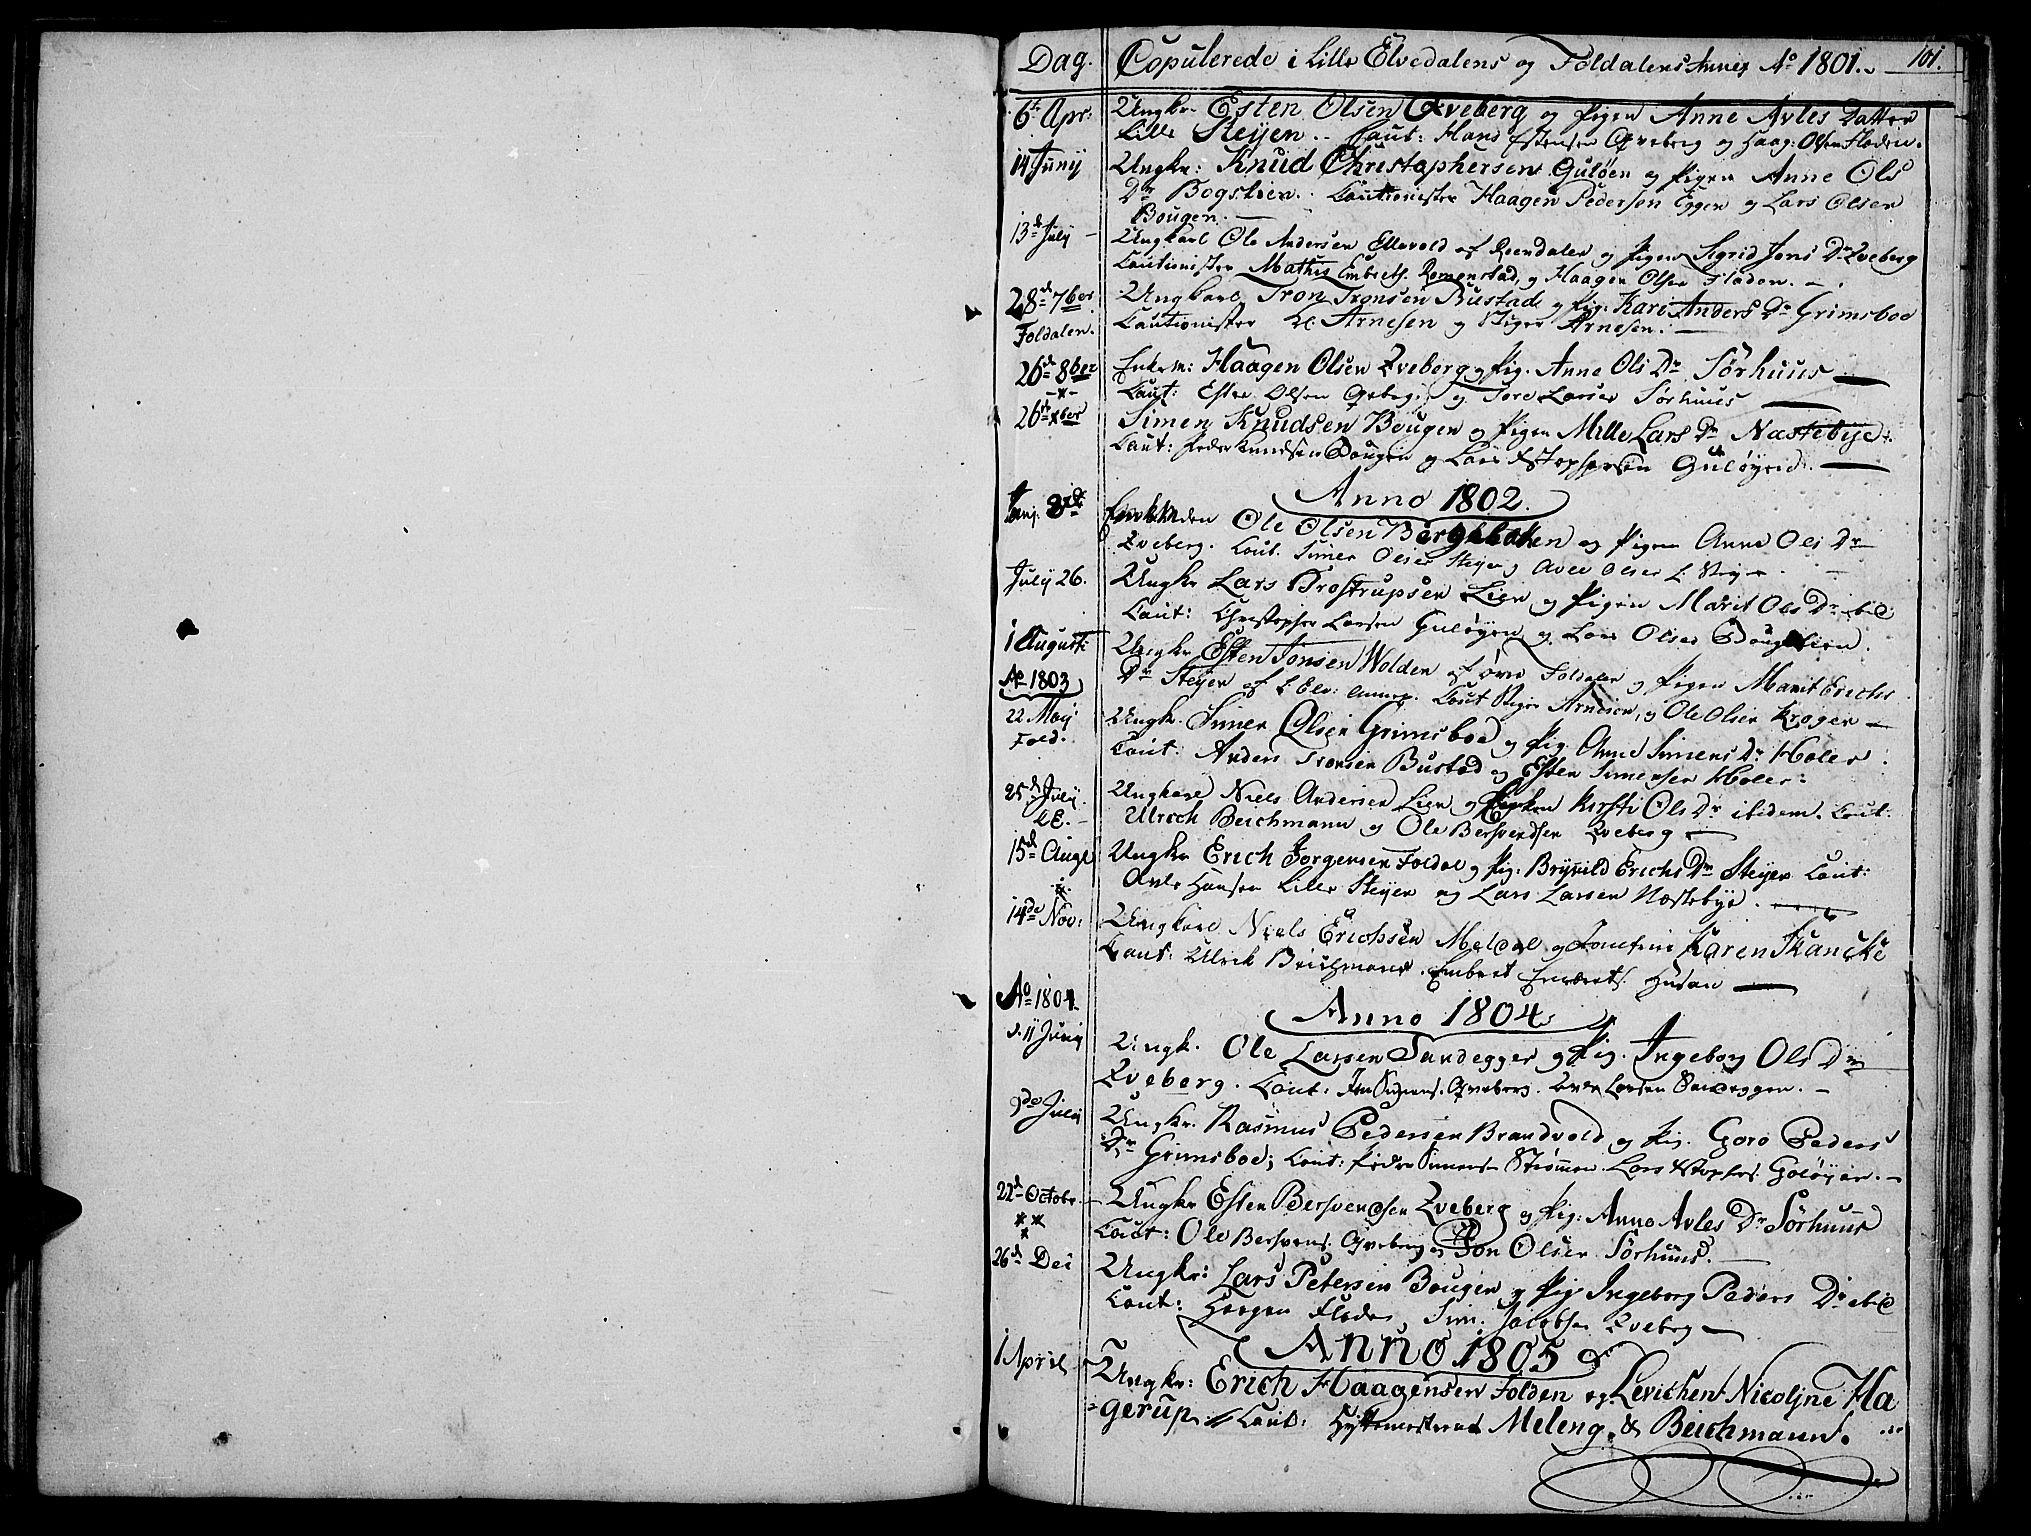 SAH, Tynset prestekontor, Ministerialbok nr. 16, 1801-1814, s. 101